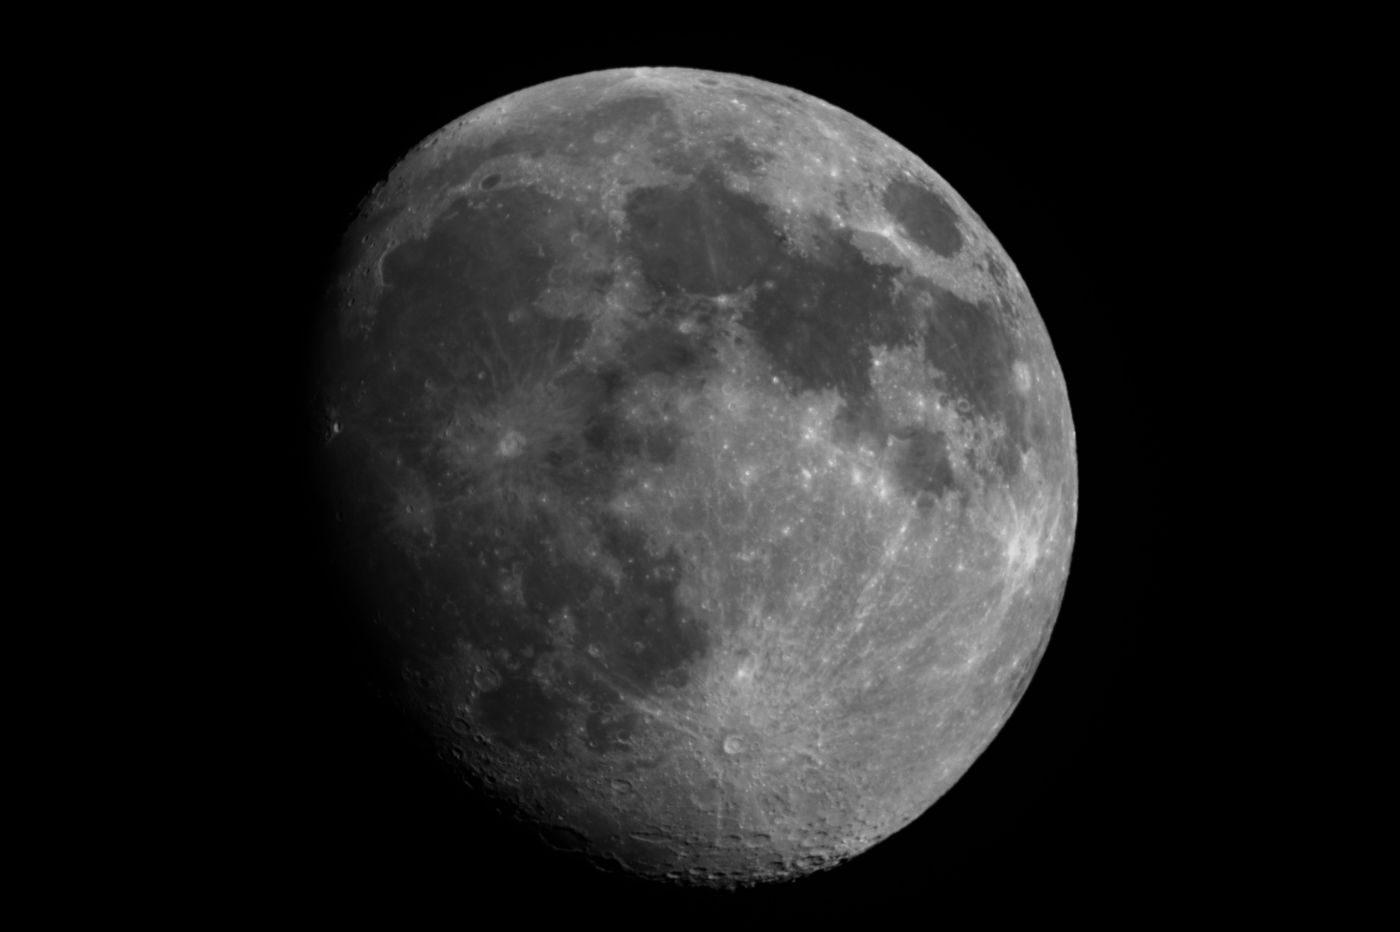 Lune - Moon